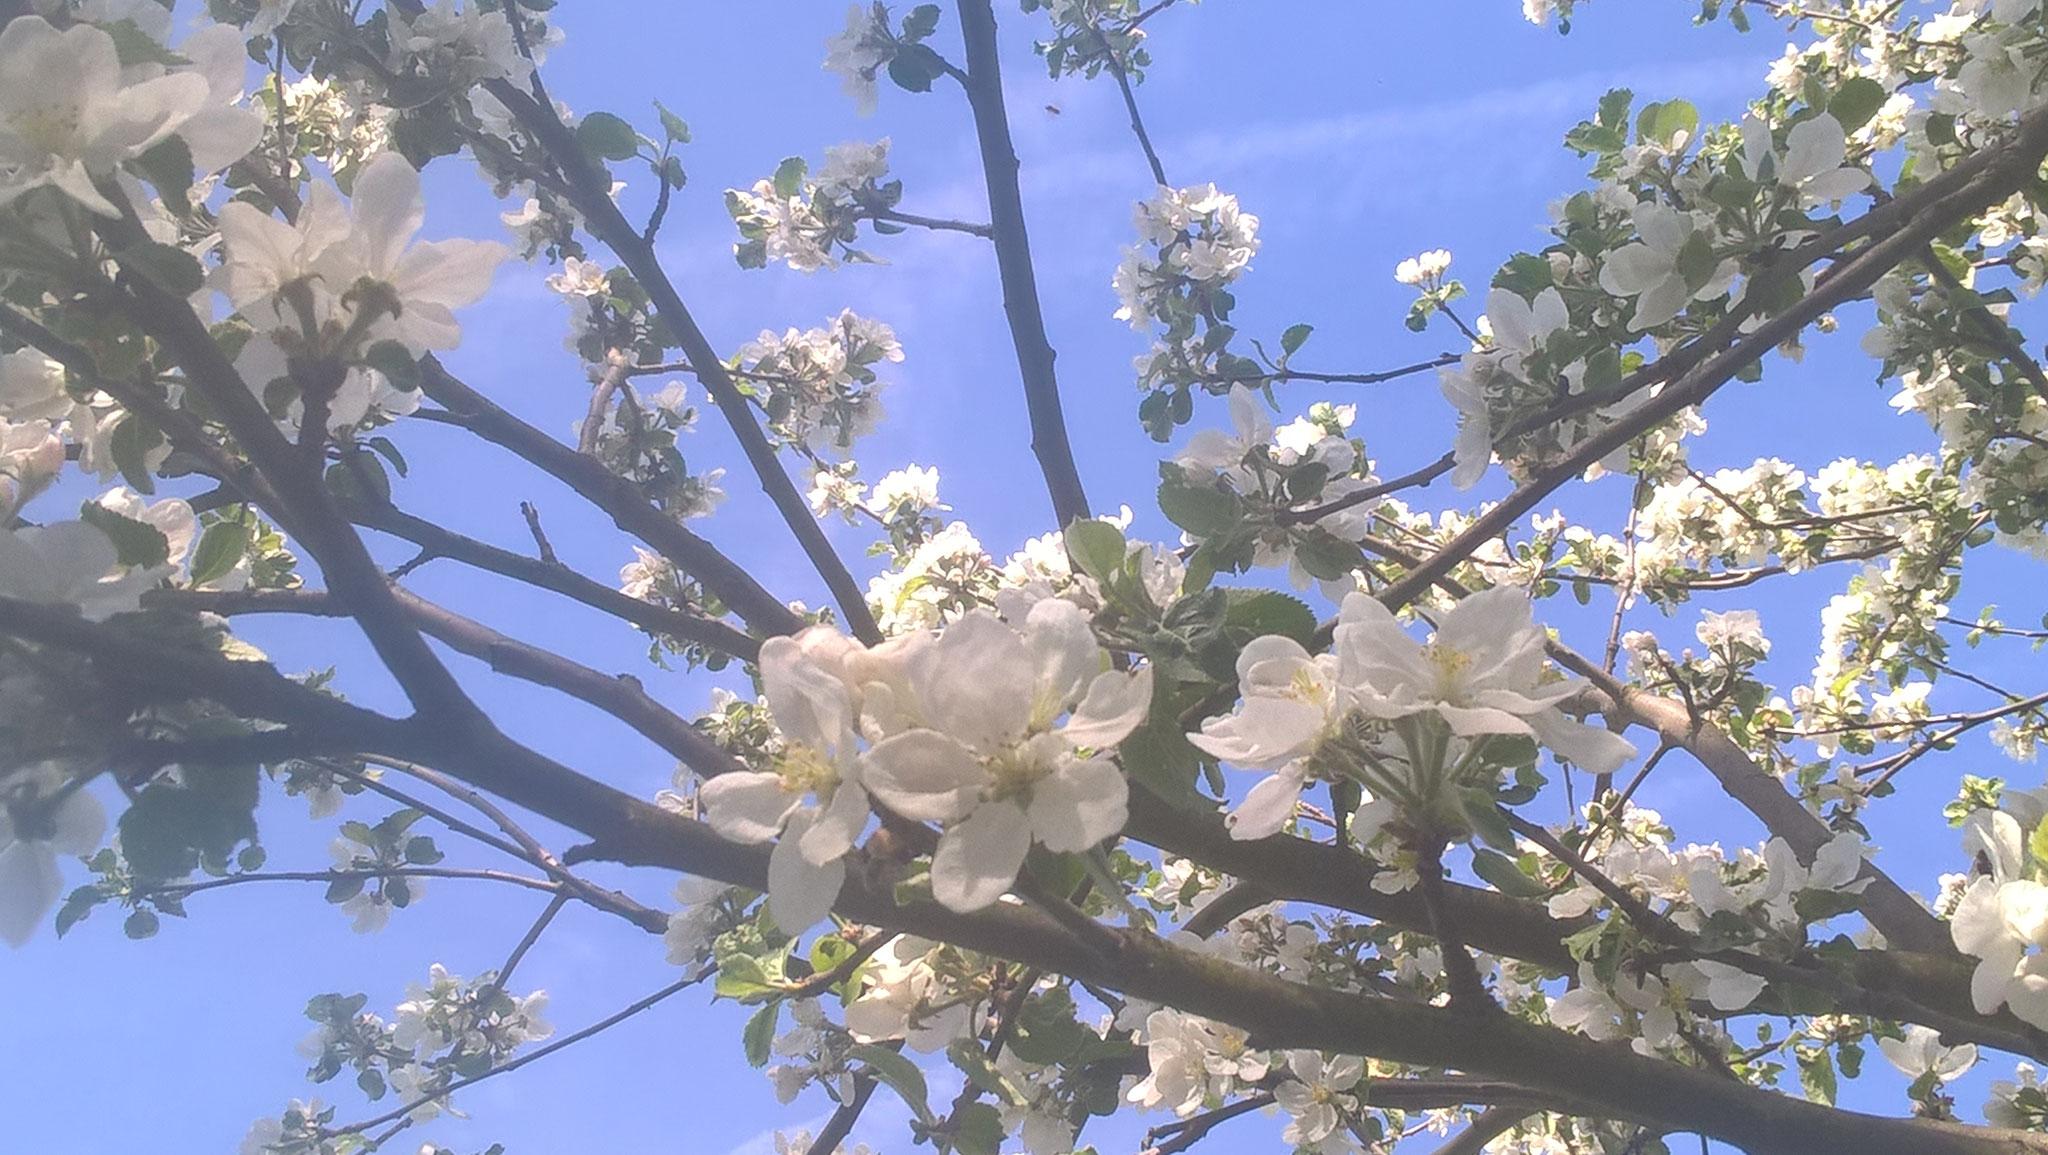 Apfelbaumblüten. Foto: R. Nagel-Kroll